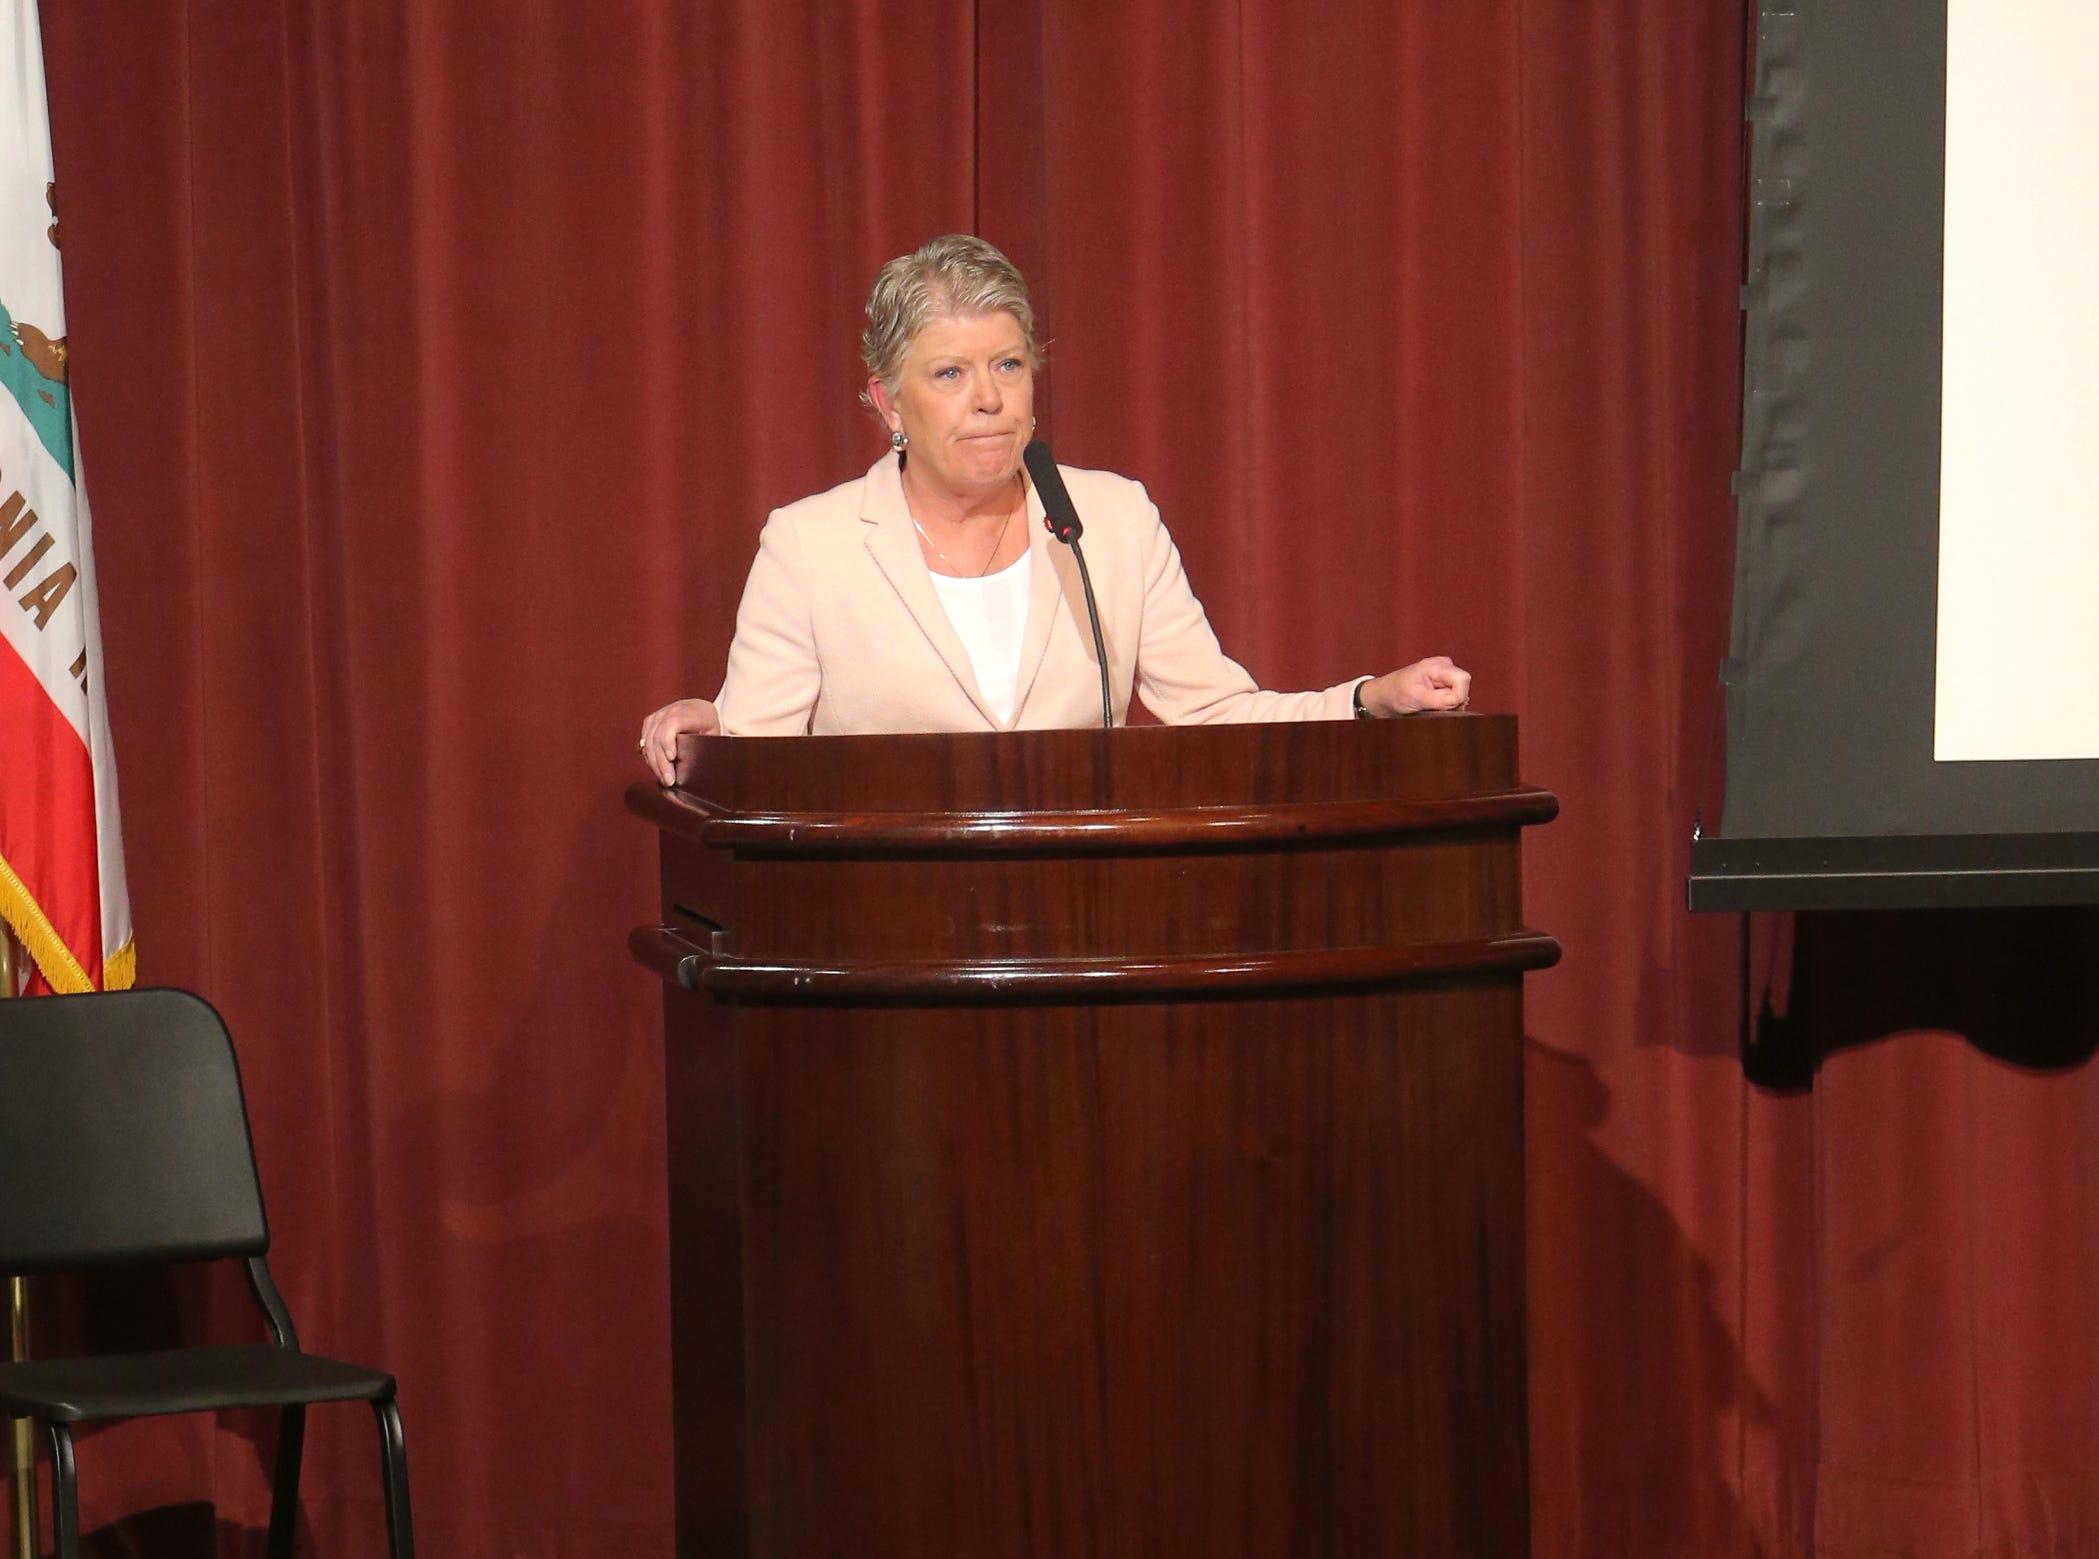 Congresswoman Julia Brownley, D-Westlake Village, speaks during a forum on gun violence held Sunday at Westlake High School. Around 200 people attended the event.